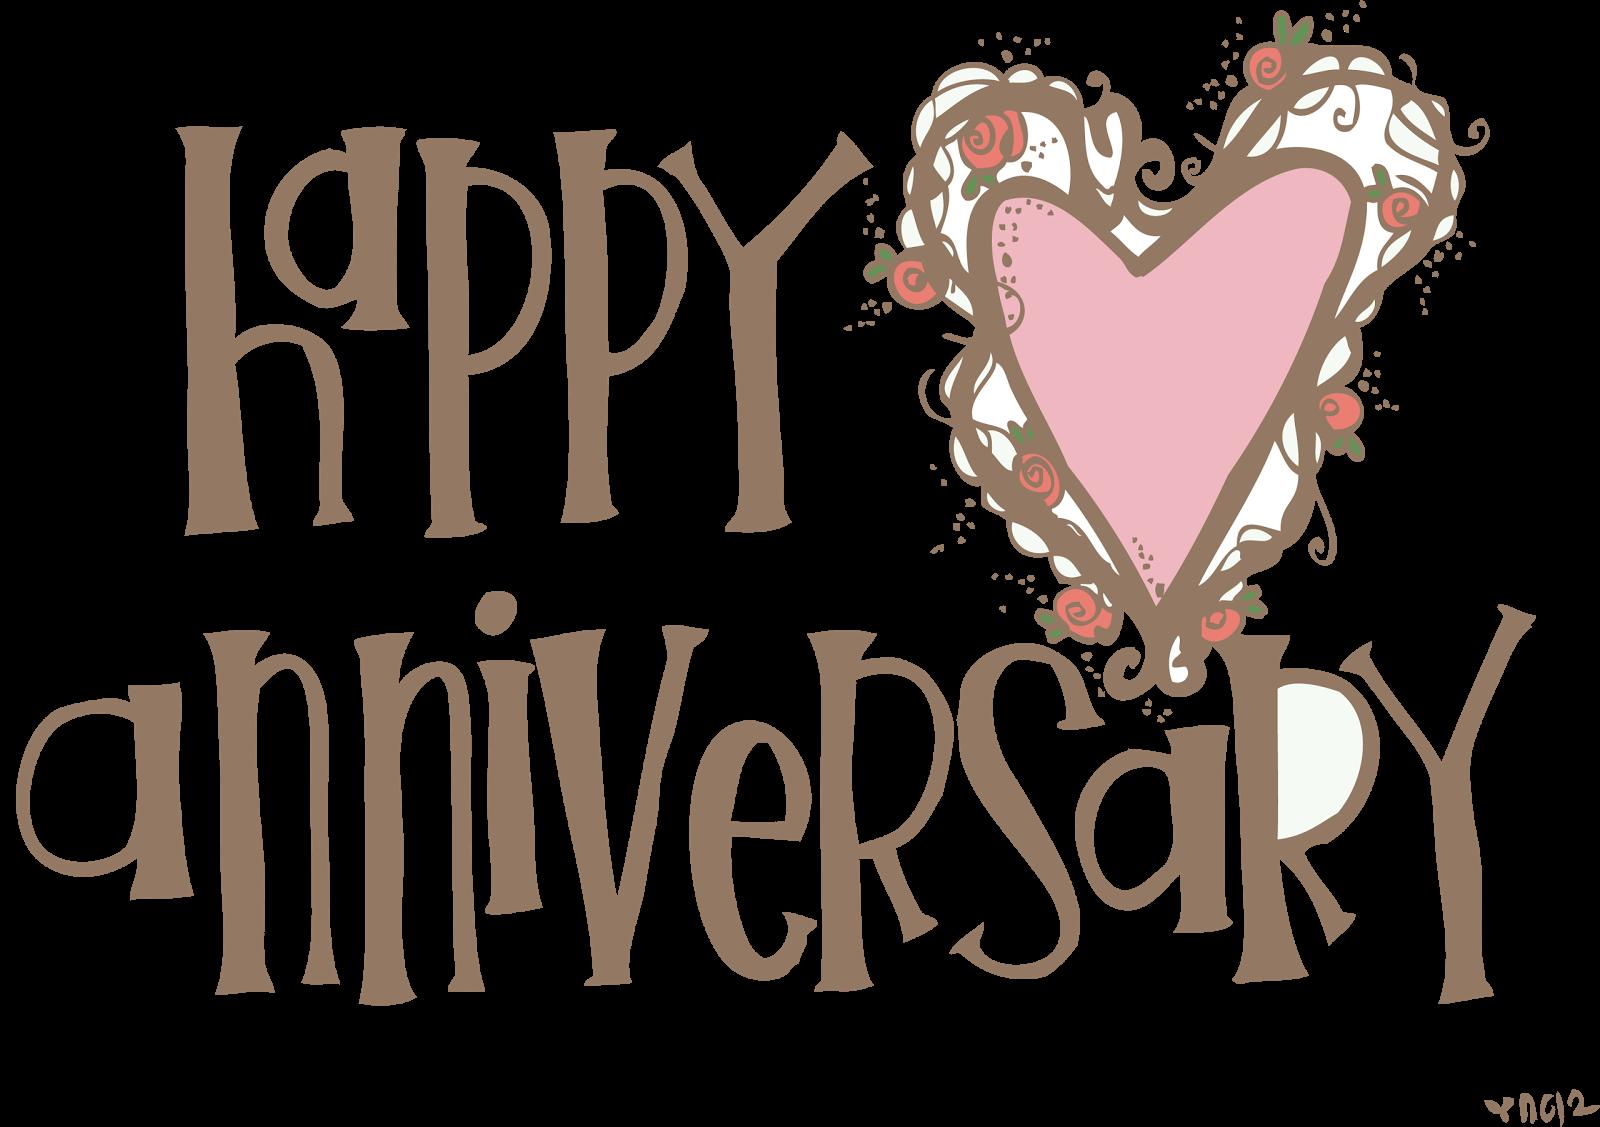 April clipart anniversary, April anniversary Transparent.